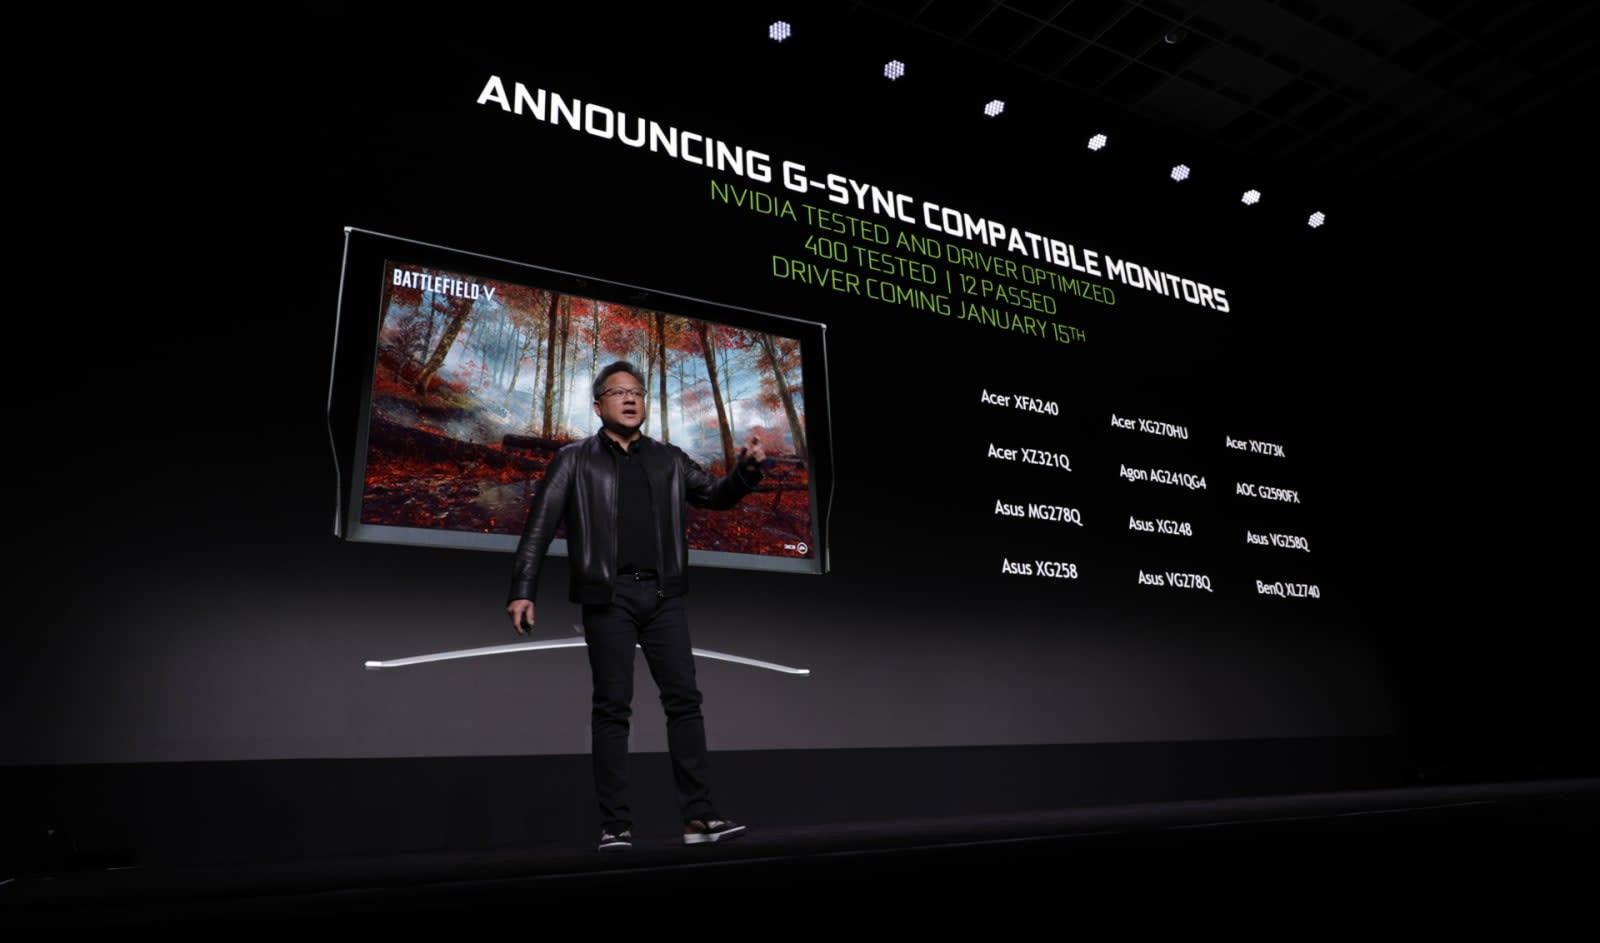 NVIDIA certifies a dozen FreeSync monitors as 'G-SYNC